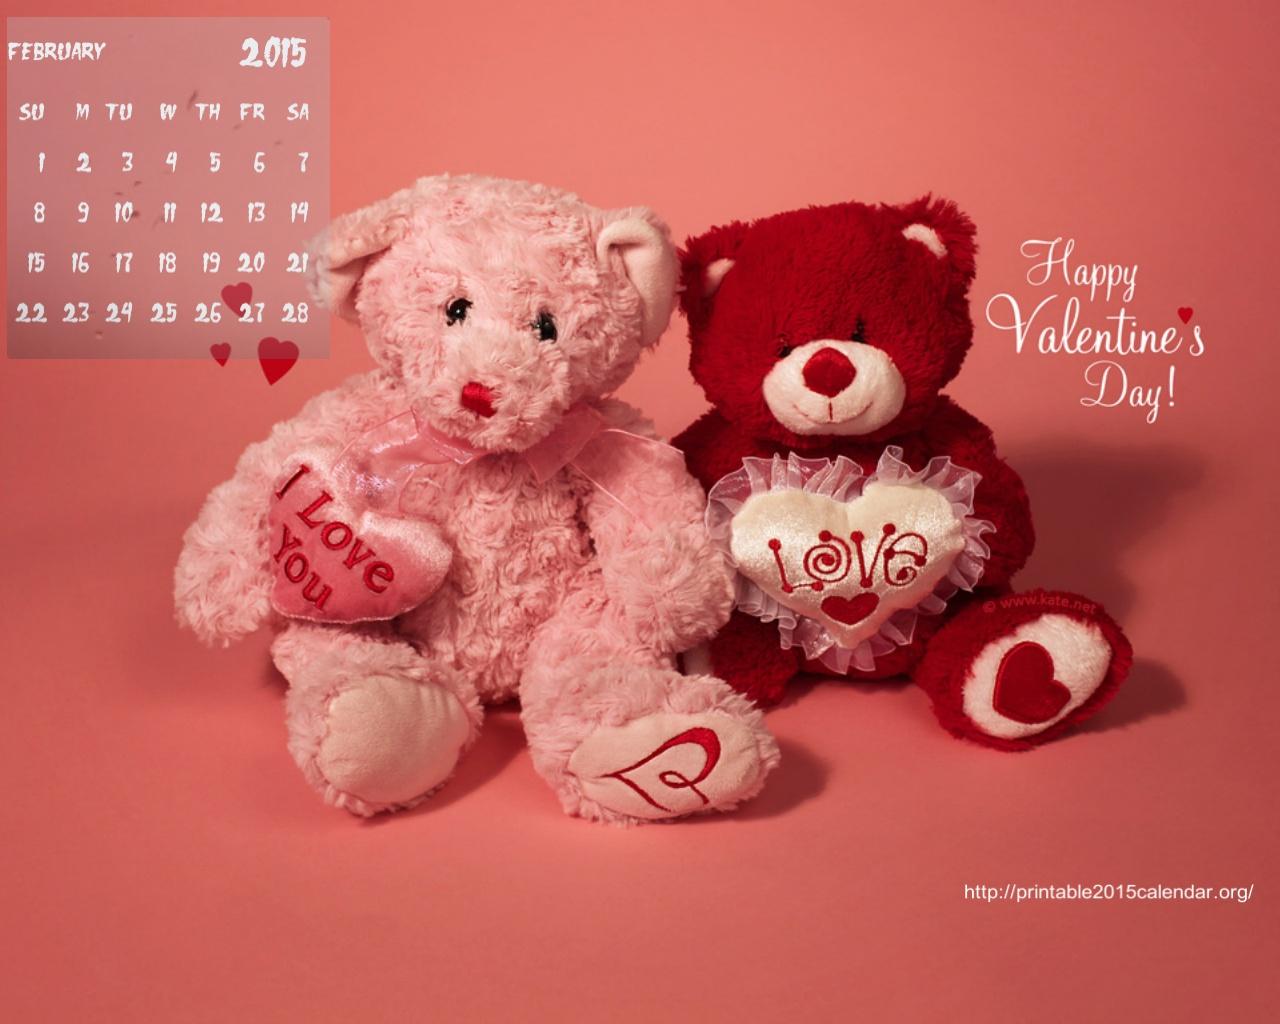 47] February Calendar 2015 Wallpaper on WallpaperSafari 1280x1024